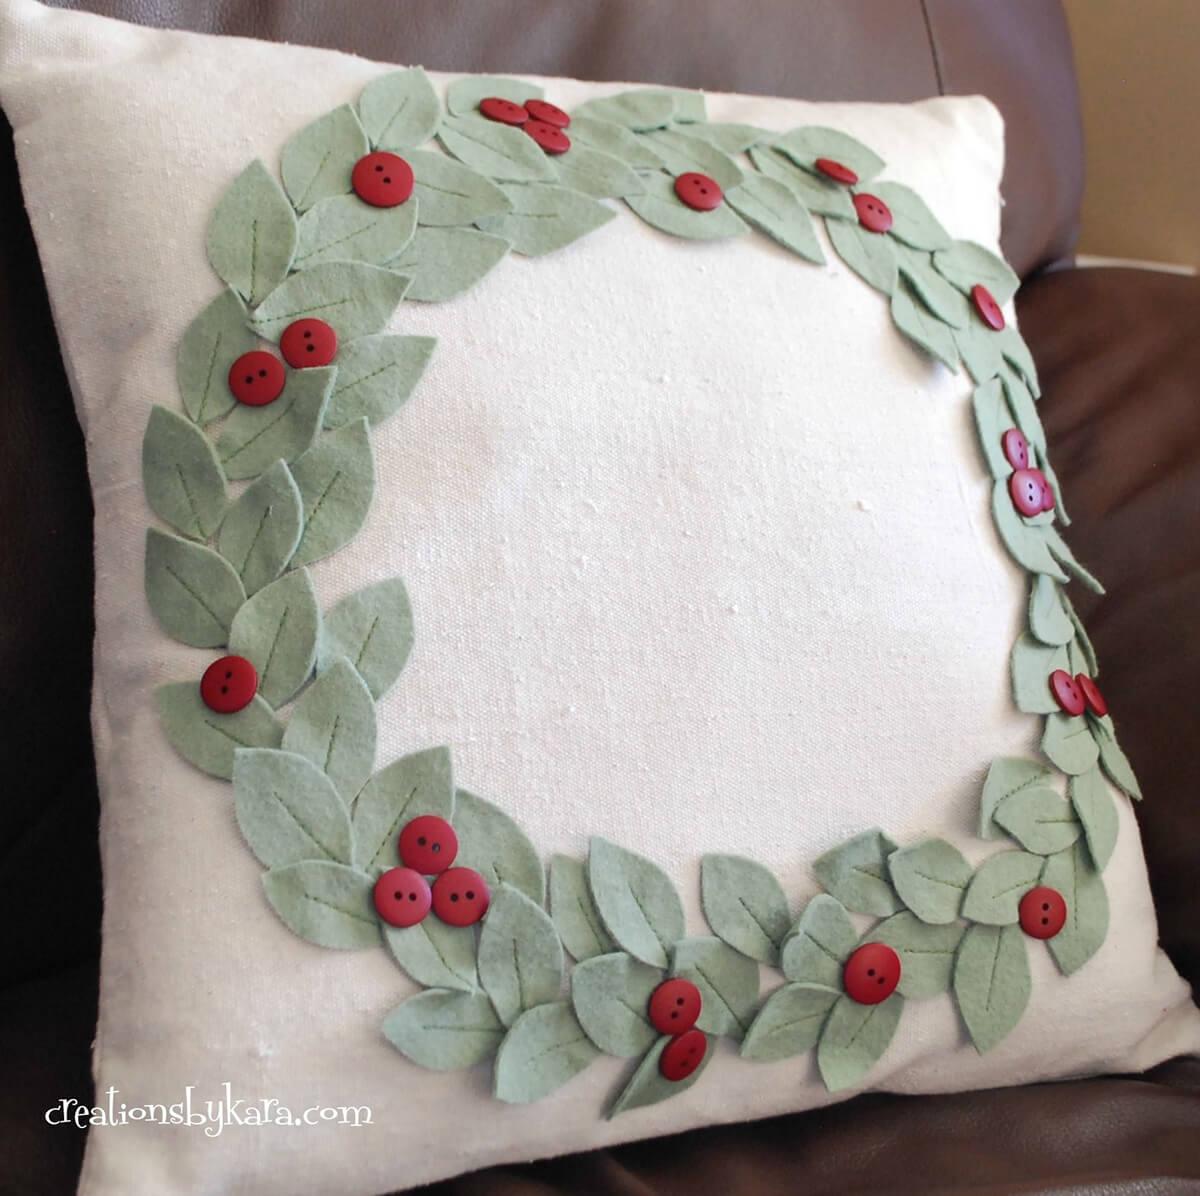 Festive Felt and Buttons Holly Wreath Pillow